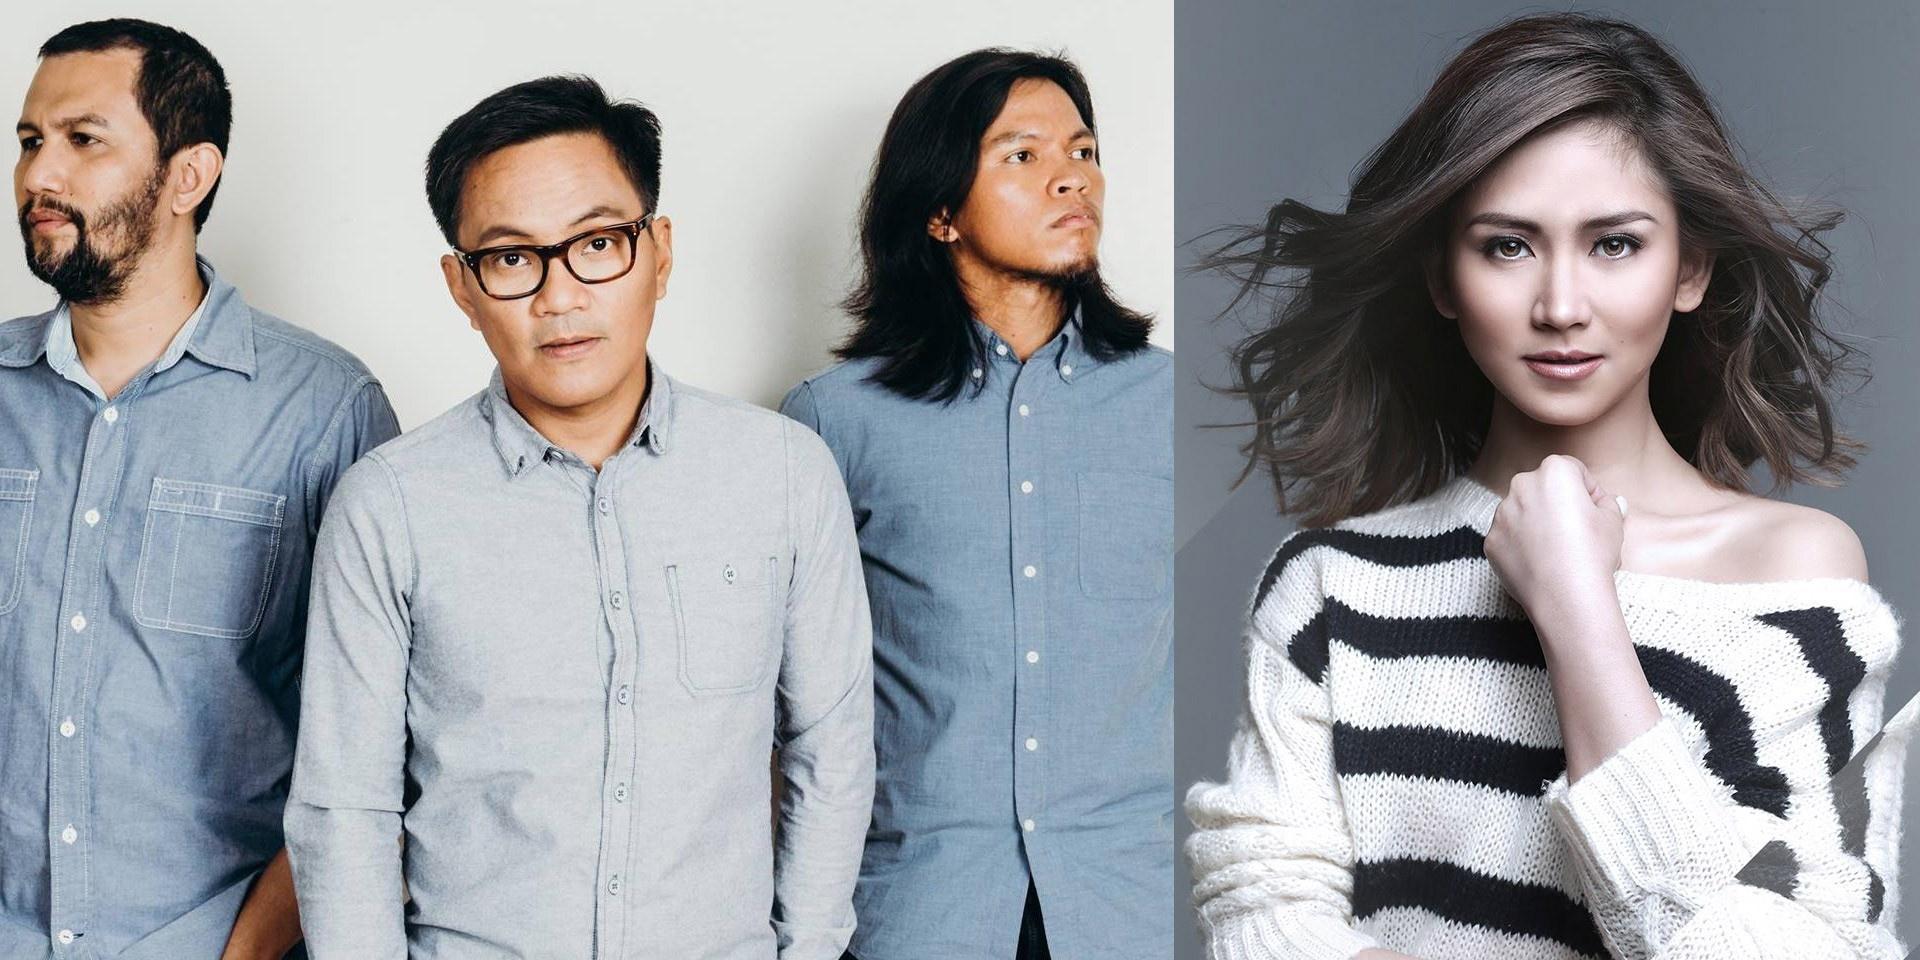 Sarah Geronimo shares the stage with Ebe Dancel, Bullet Dumas, Johnoy Danao – watch